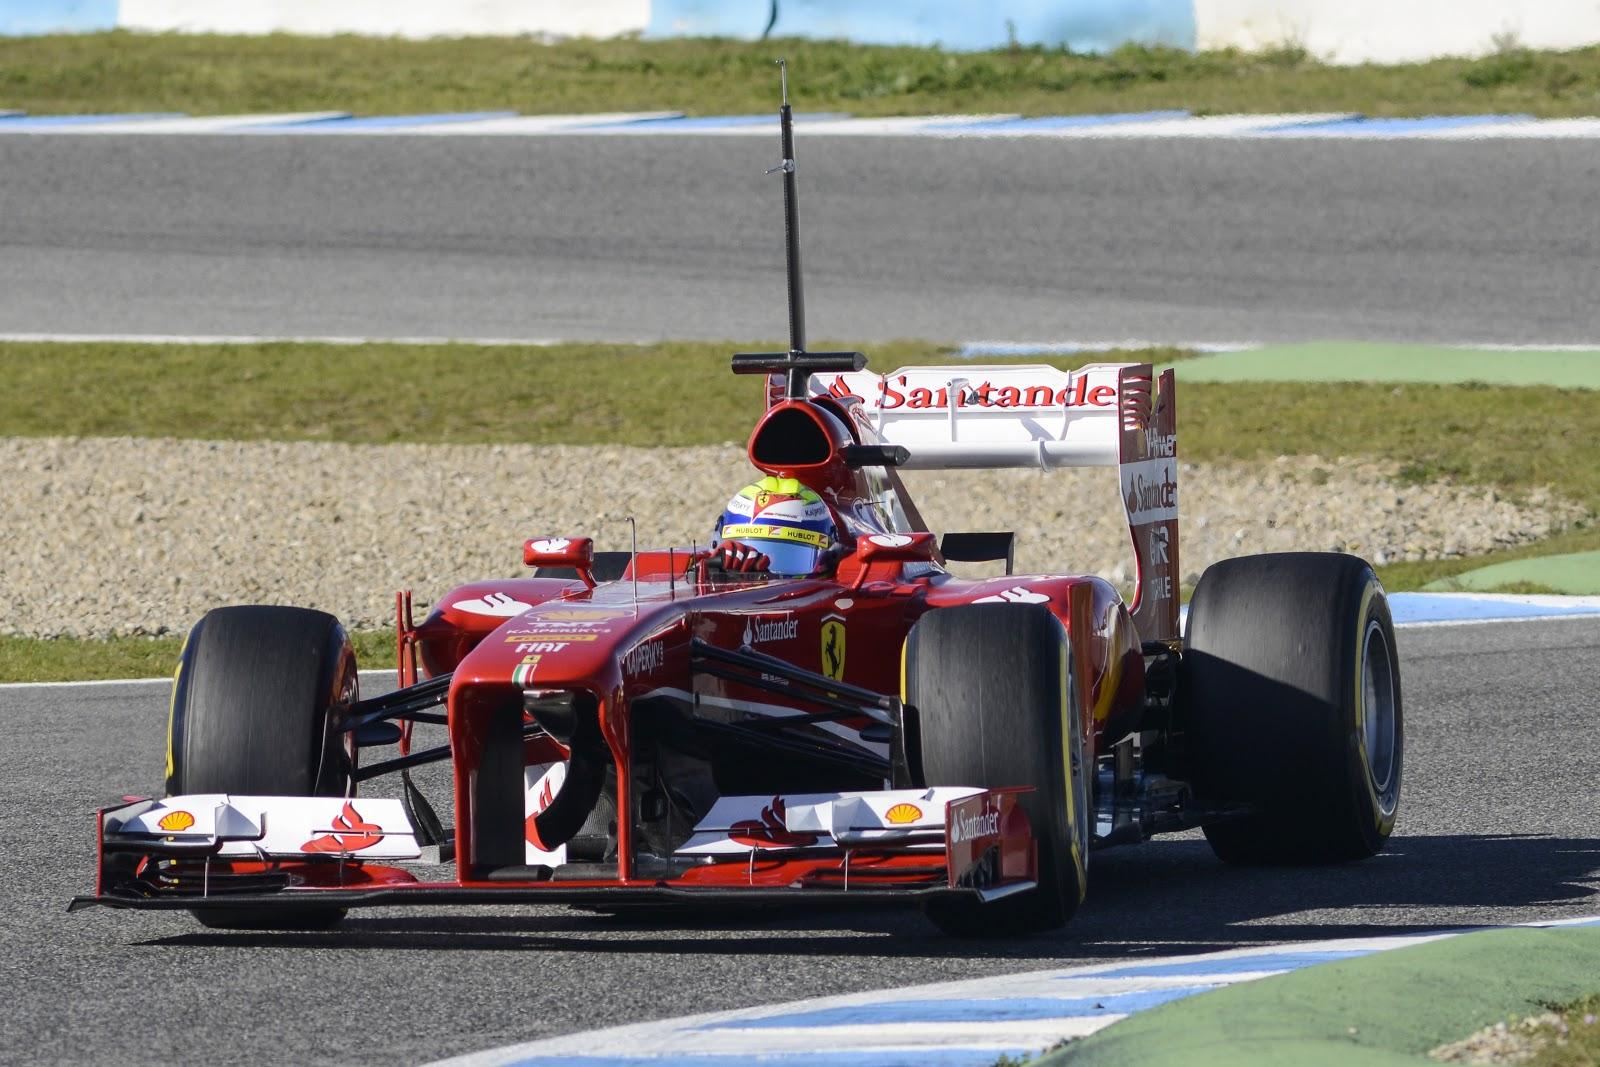 Formula 1 Technical Specifications 2013 Car Ferrari Engine Diagram Scuderia Name F138 Chassis Carbon Fibre Tyres Pirelli P Zero Team Principal Stefano Domenicali